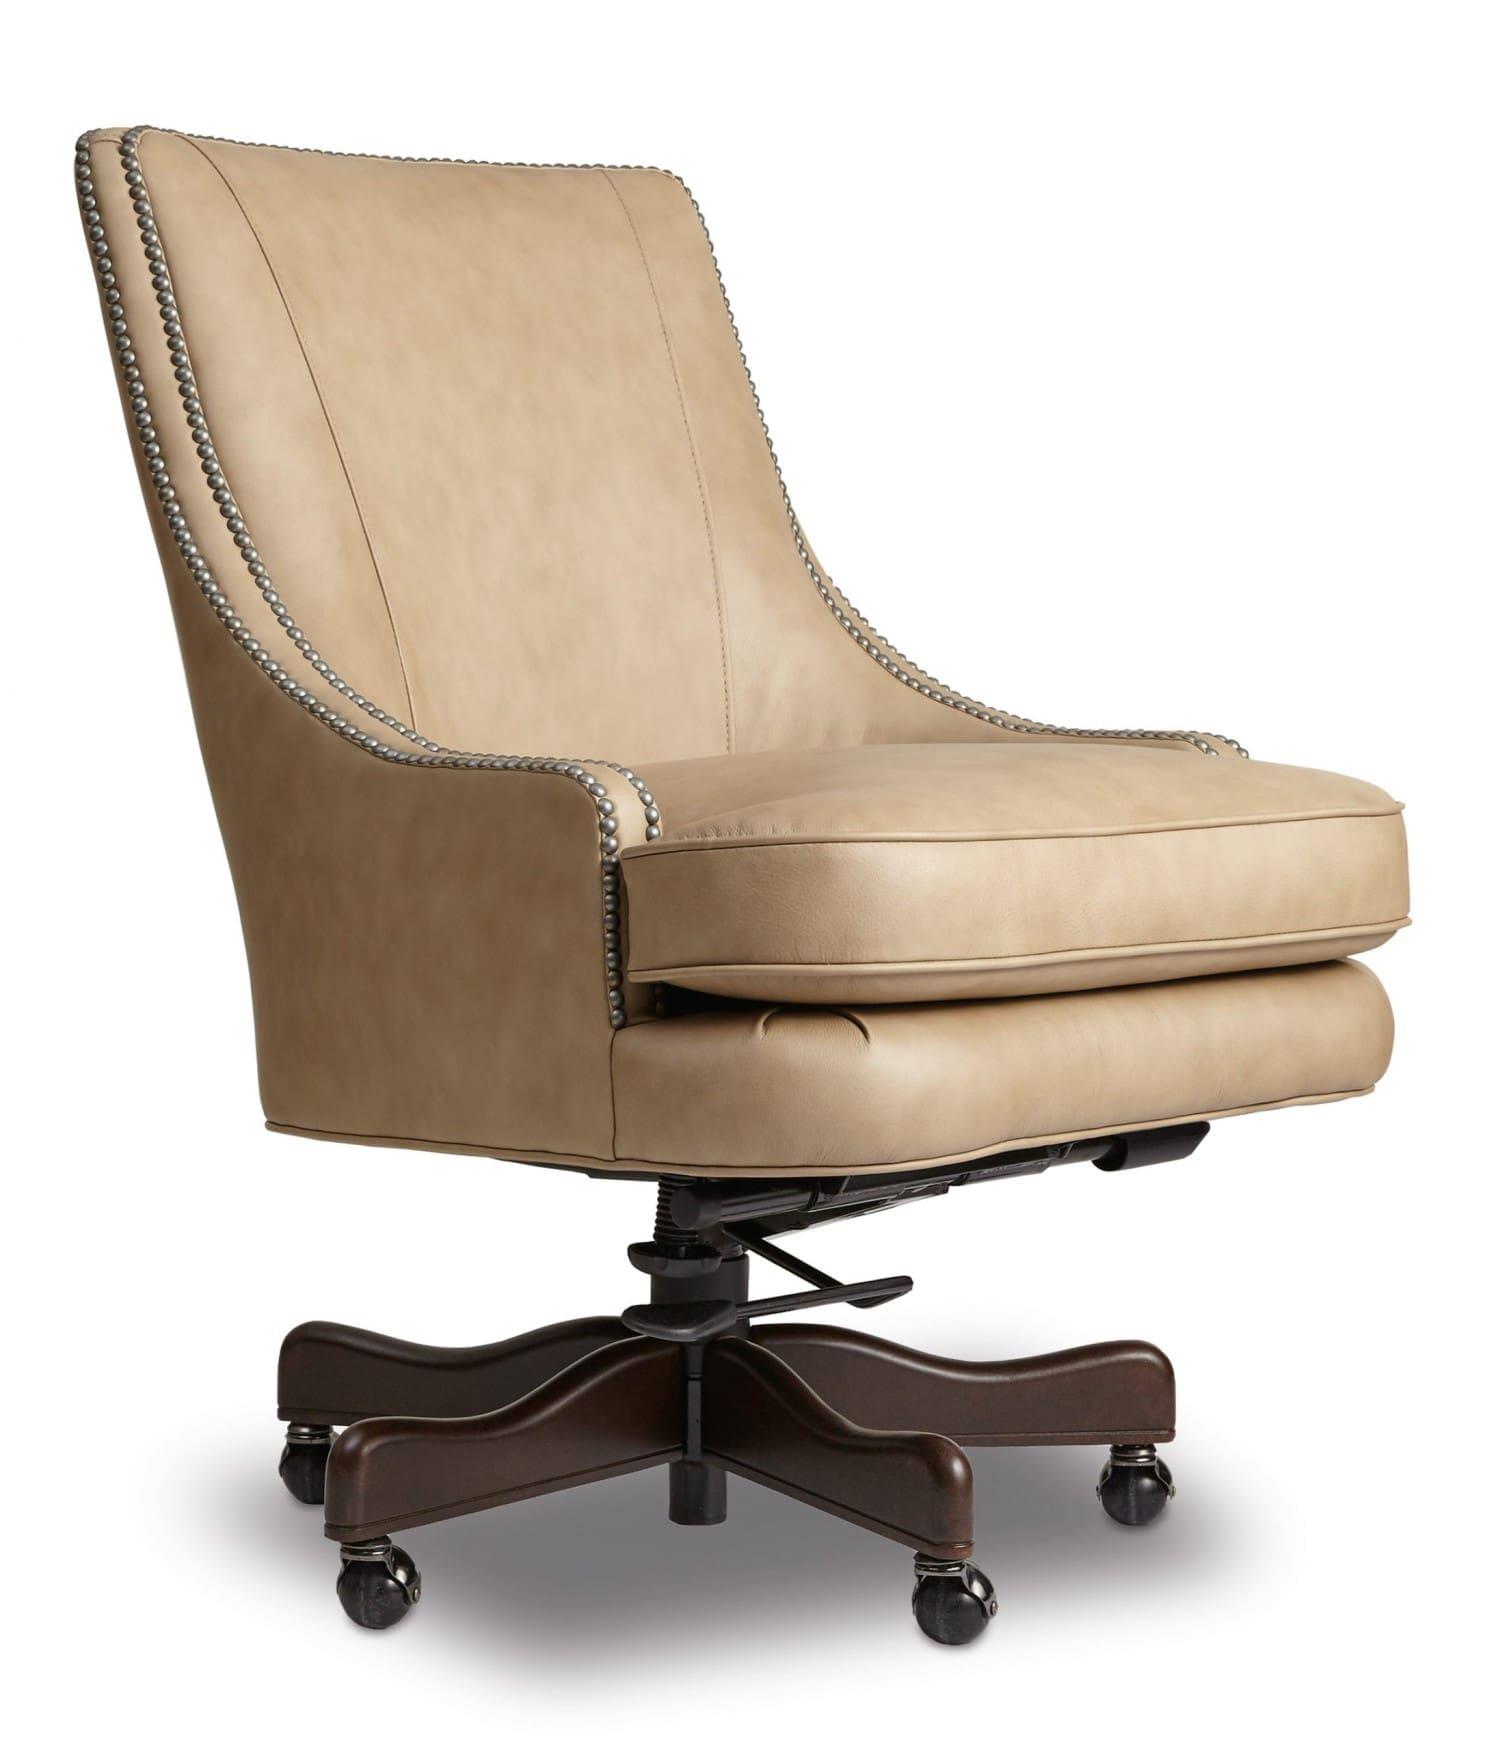 Patty Executive Swivel Tilt Chair